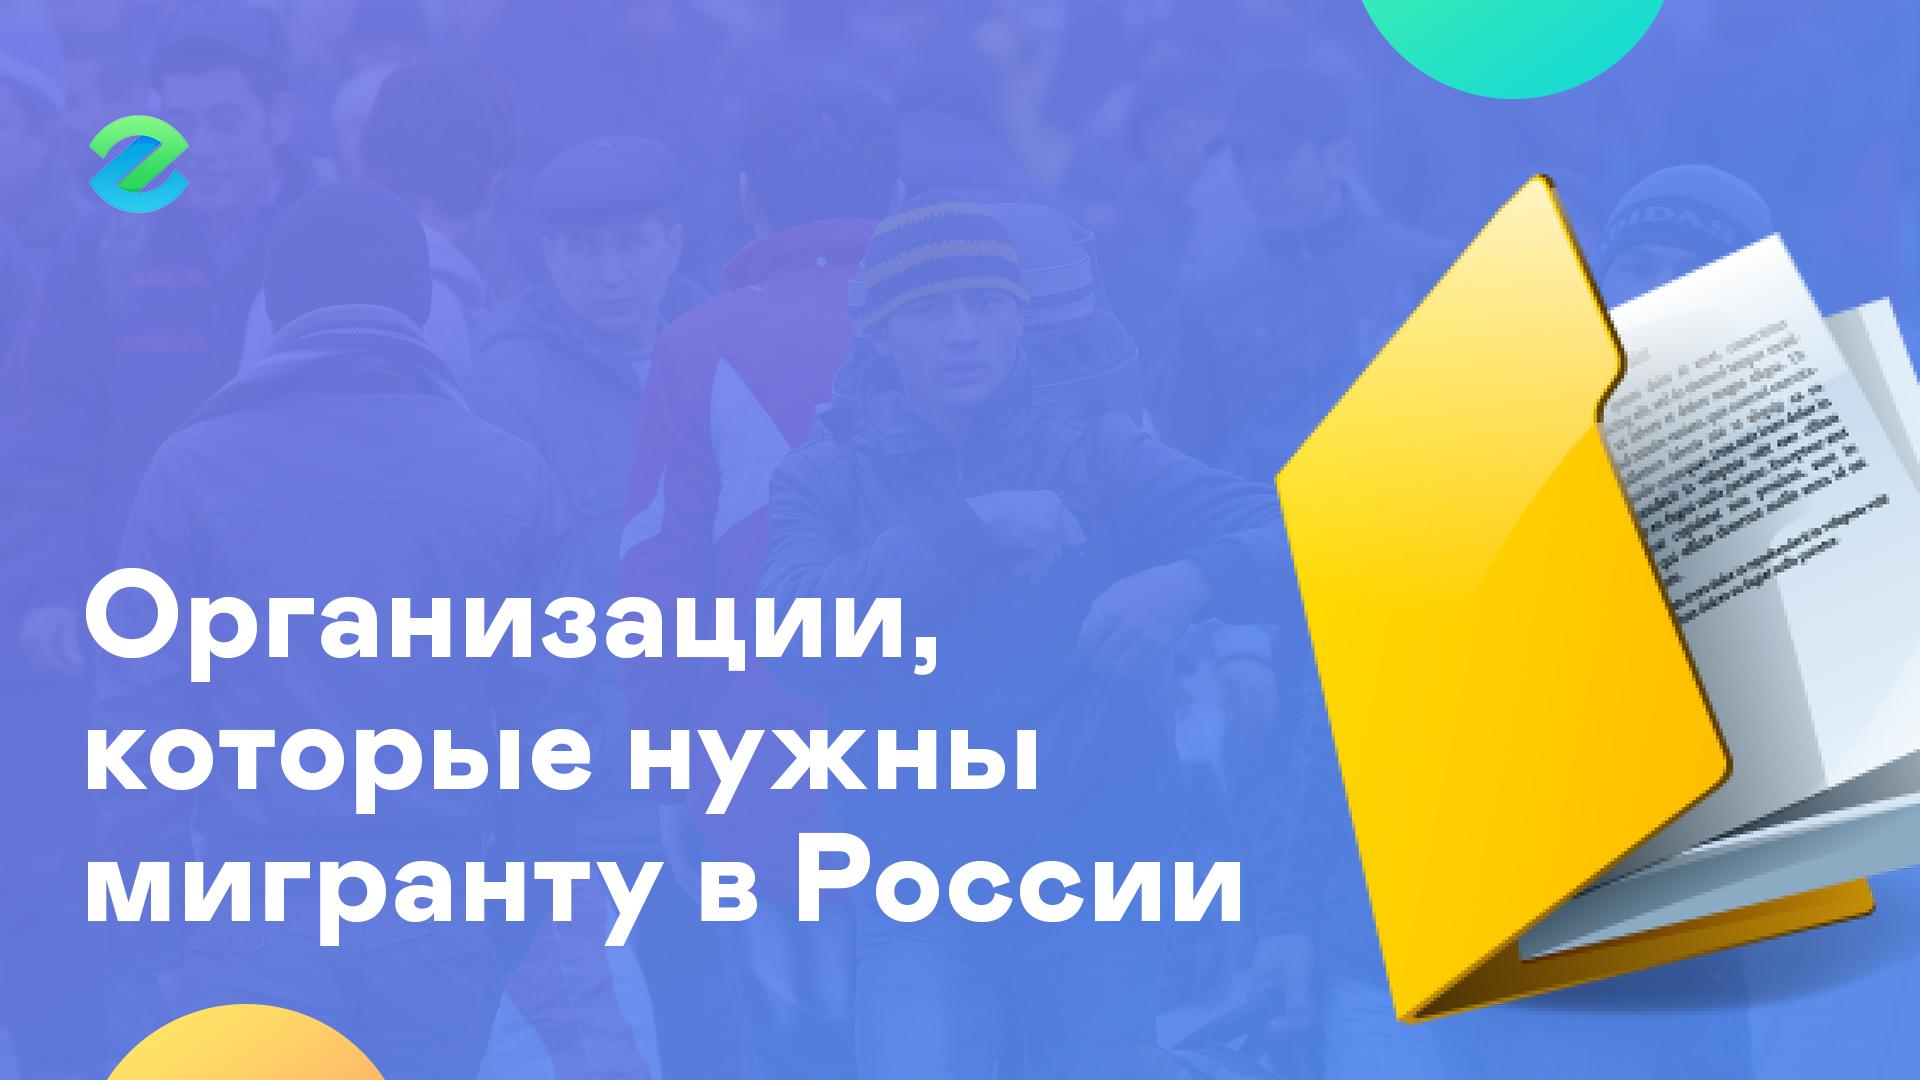 spisok servisov organizacii kotorye nuzhny migrantu v rossii - Организации, которые нужны мигранту в России